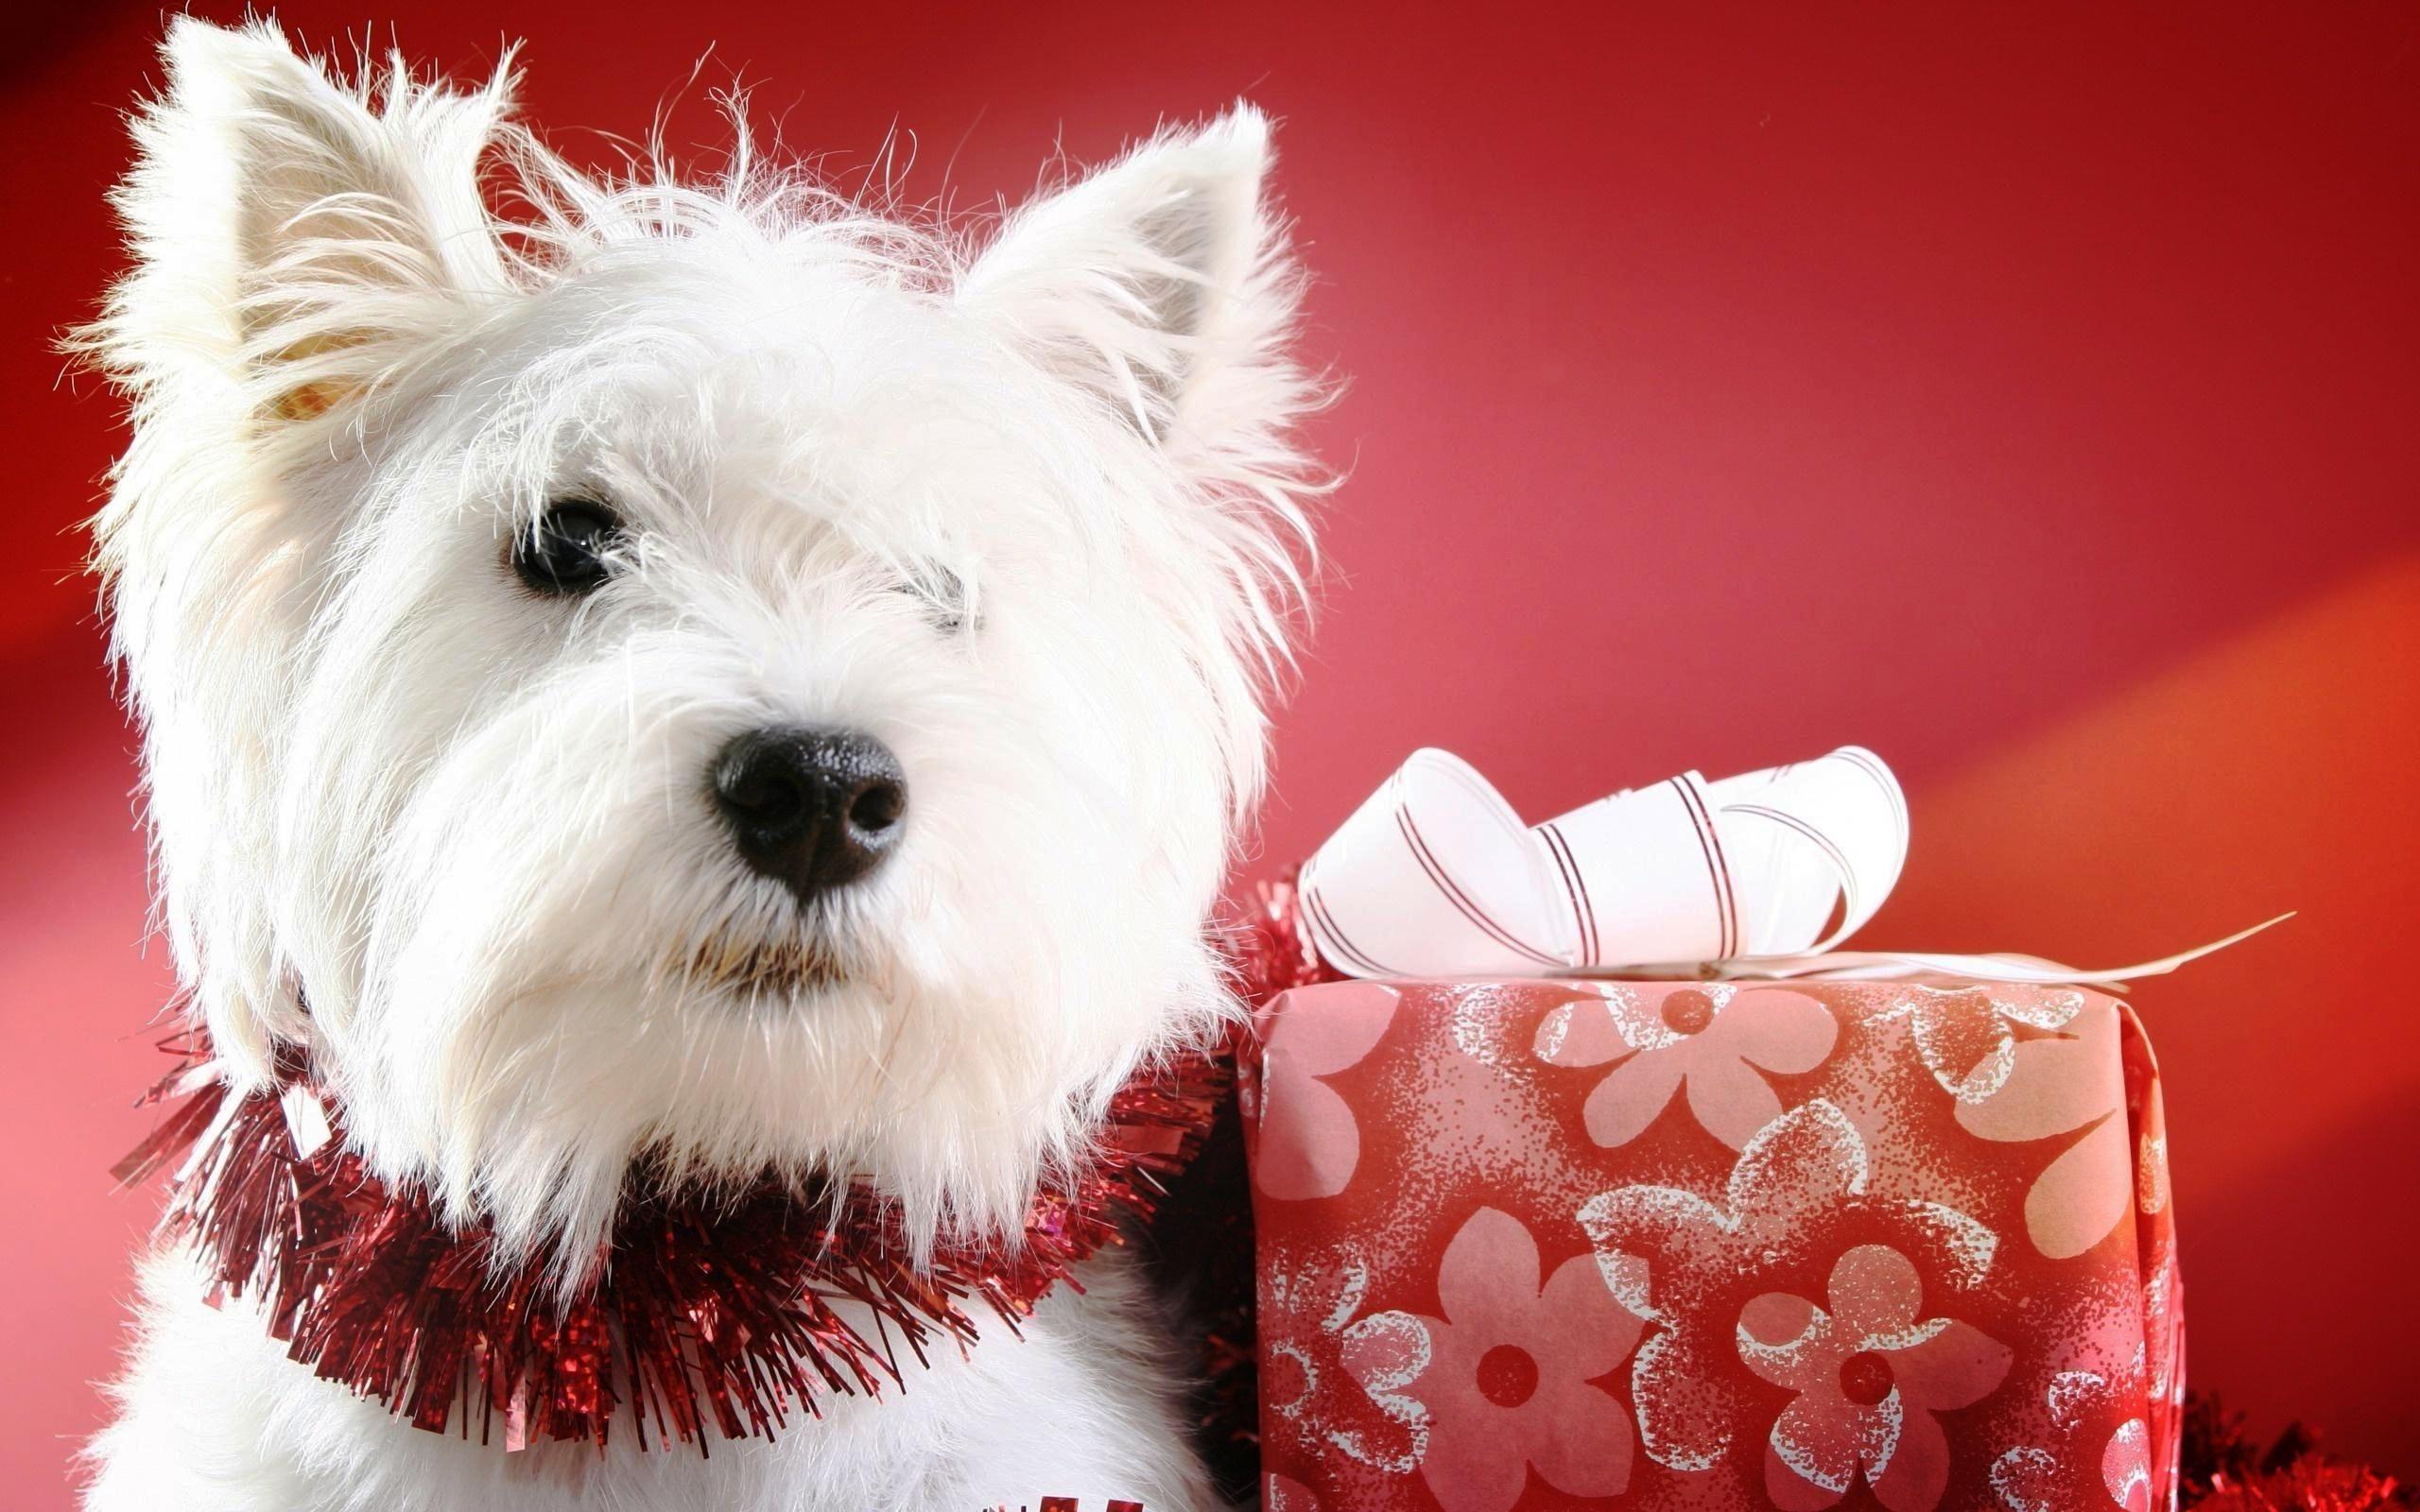 Cute Christmas Puppies Happy Christmas Wallpapers Dog Christmas Photos Christmas Puppy Dog Holiday